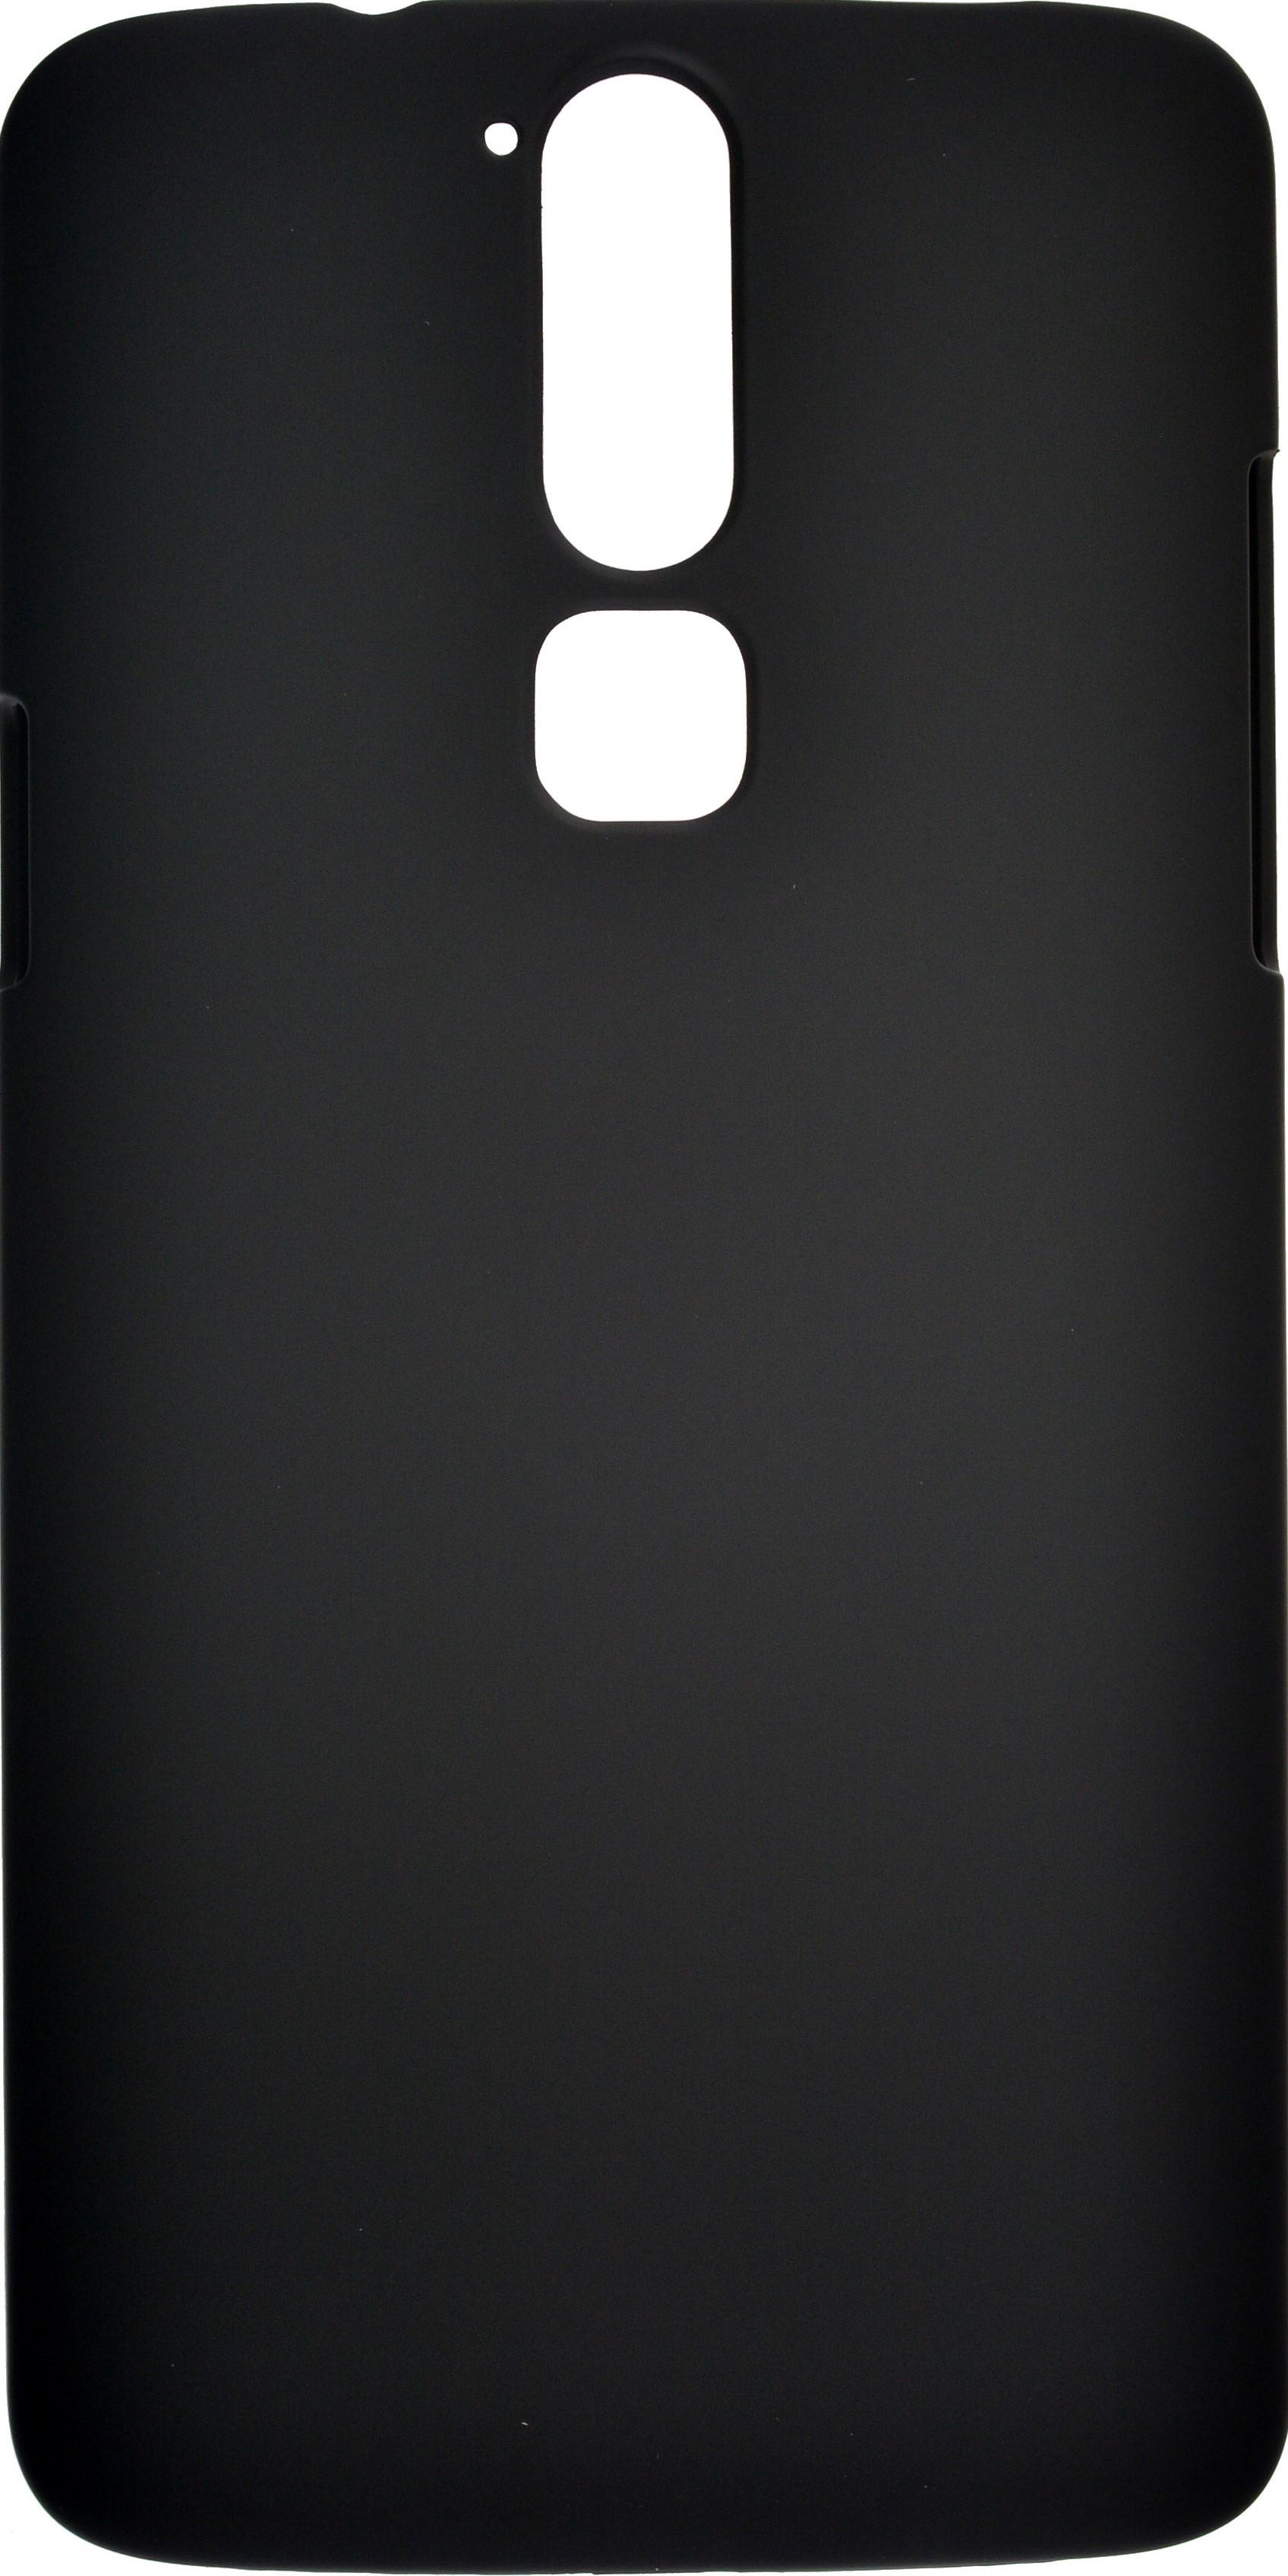 Чехол для сотового телефона skinBOX 4People, 4660041407198, черный аксессуар чехол asus zenfone 3 zc551kl skinbox 4people red t s azzc551kl 002 защитная пленка